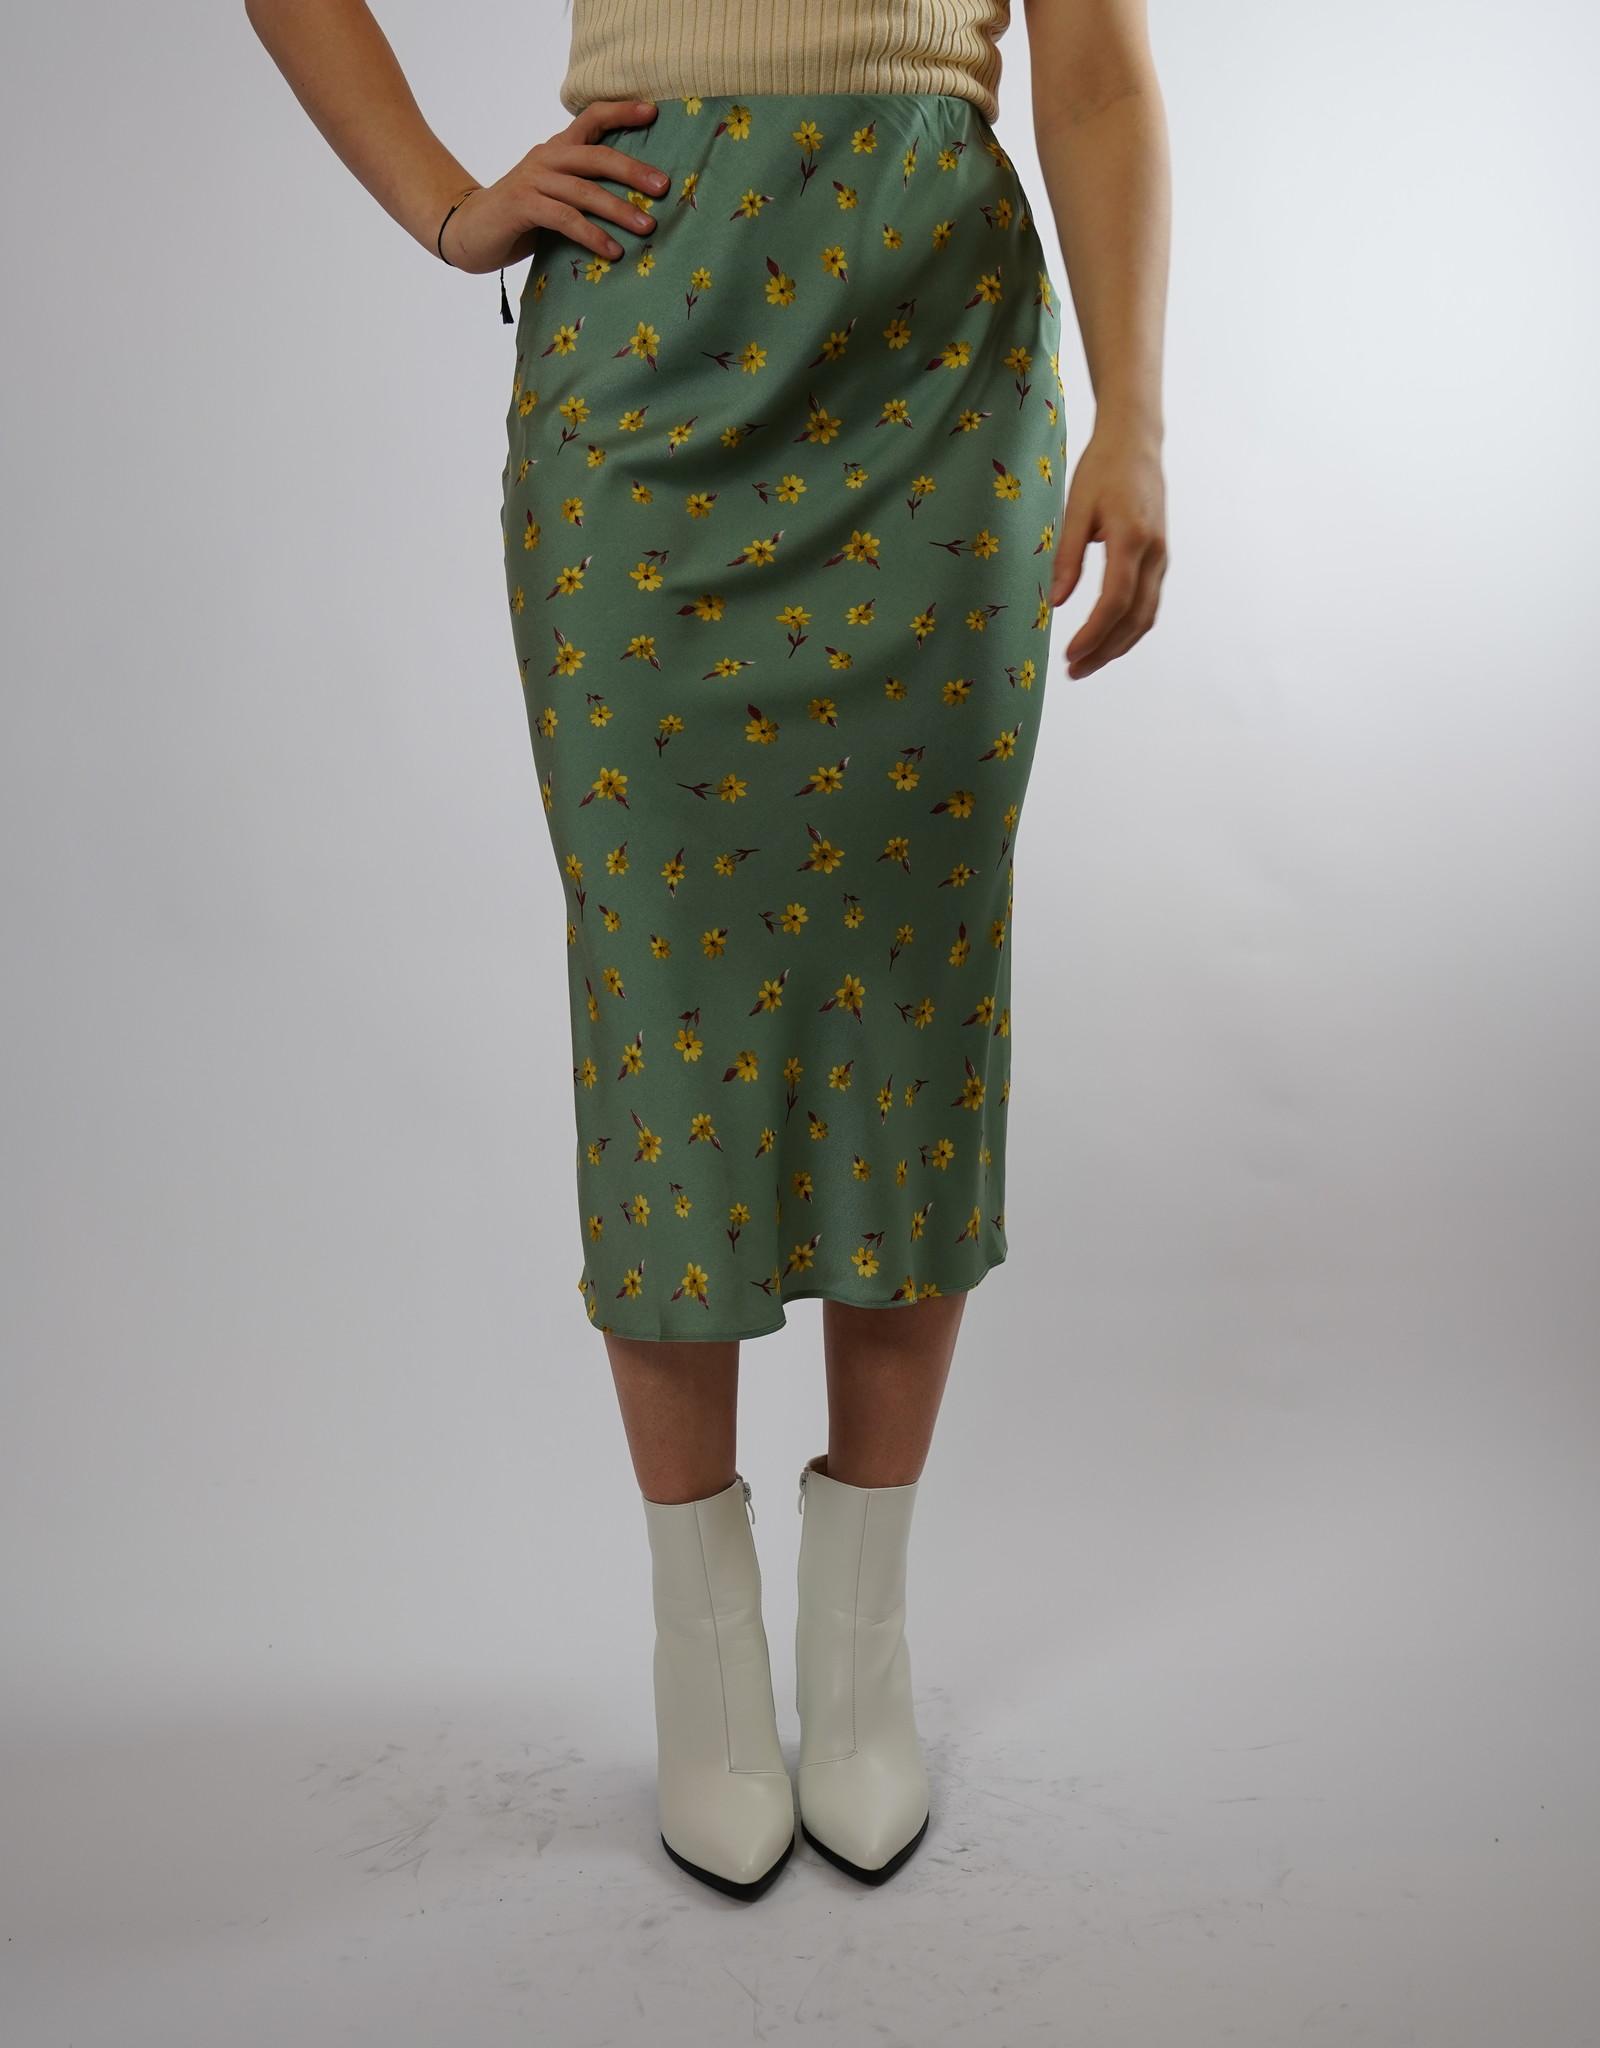 Make My Day Make My Day Satin Skirt Flower